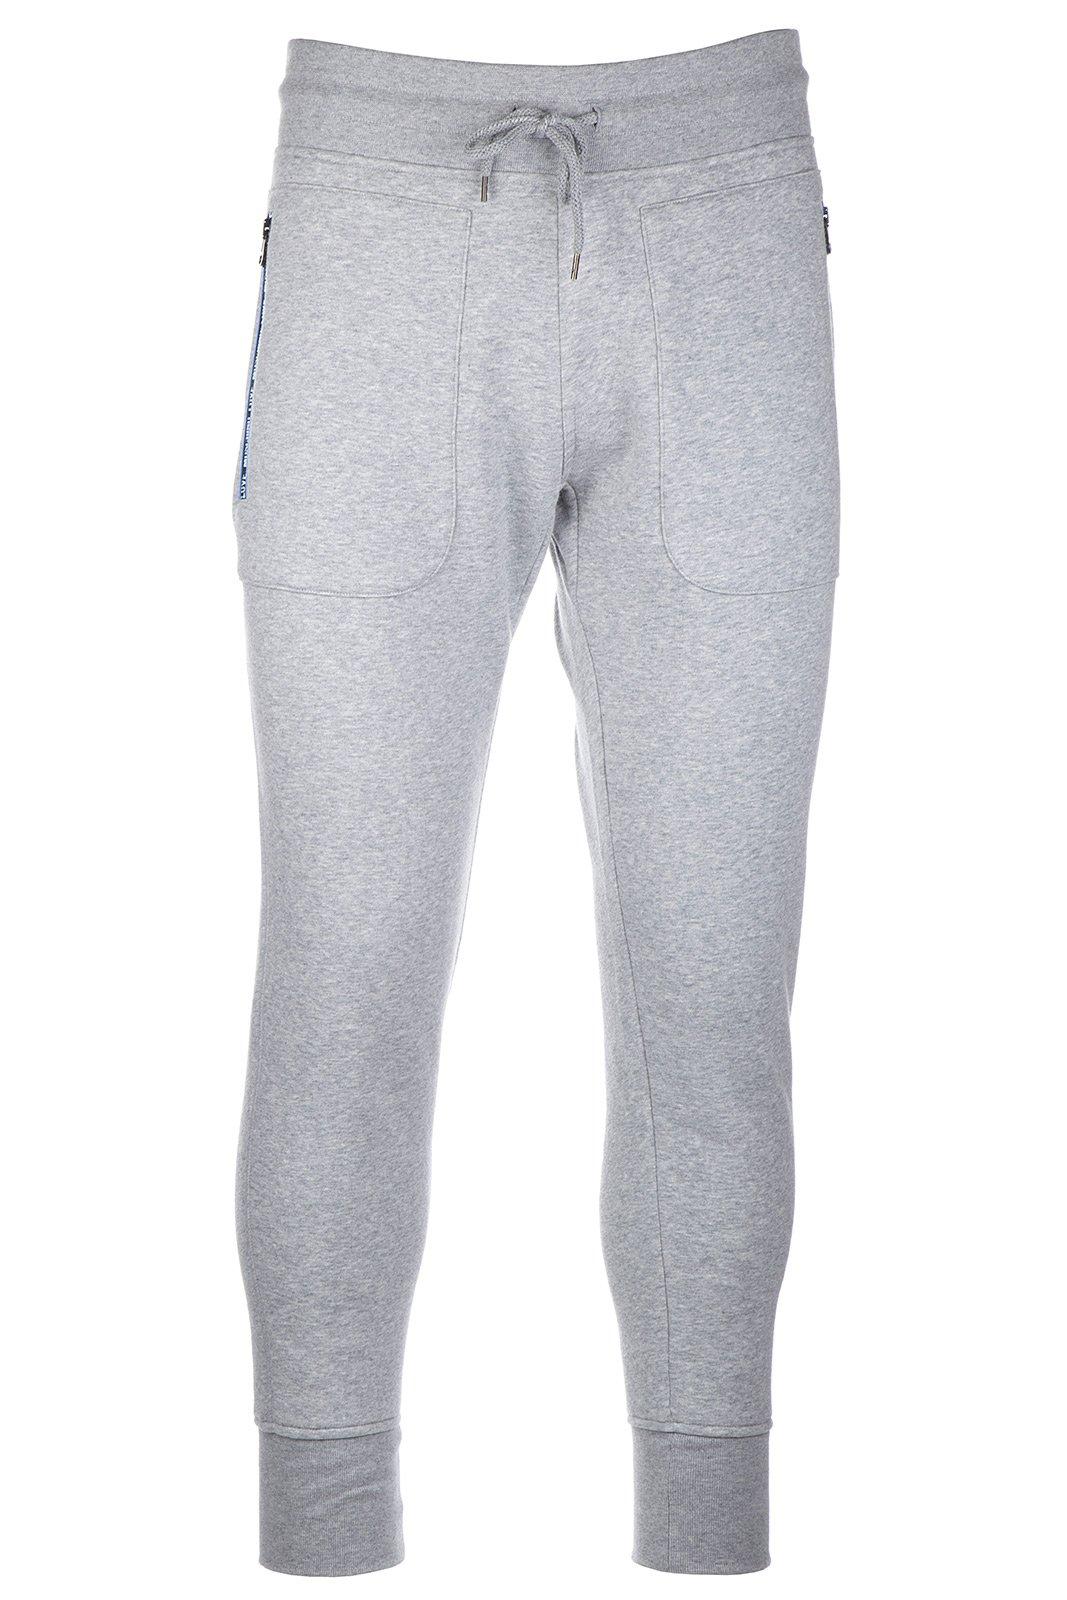 Love Moschino Men's Sport Jumpsuit Trousers Grey US Size M (US M) M 1 089 80 M 3685 B5